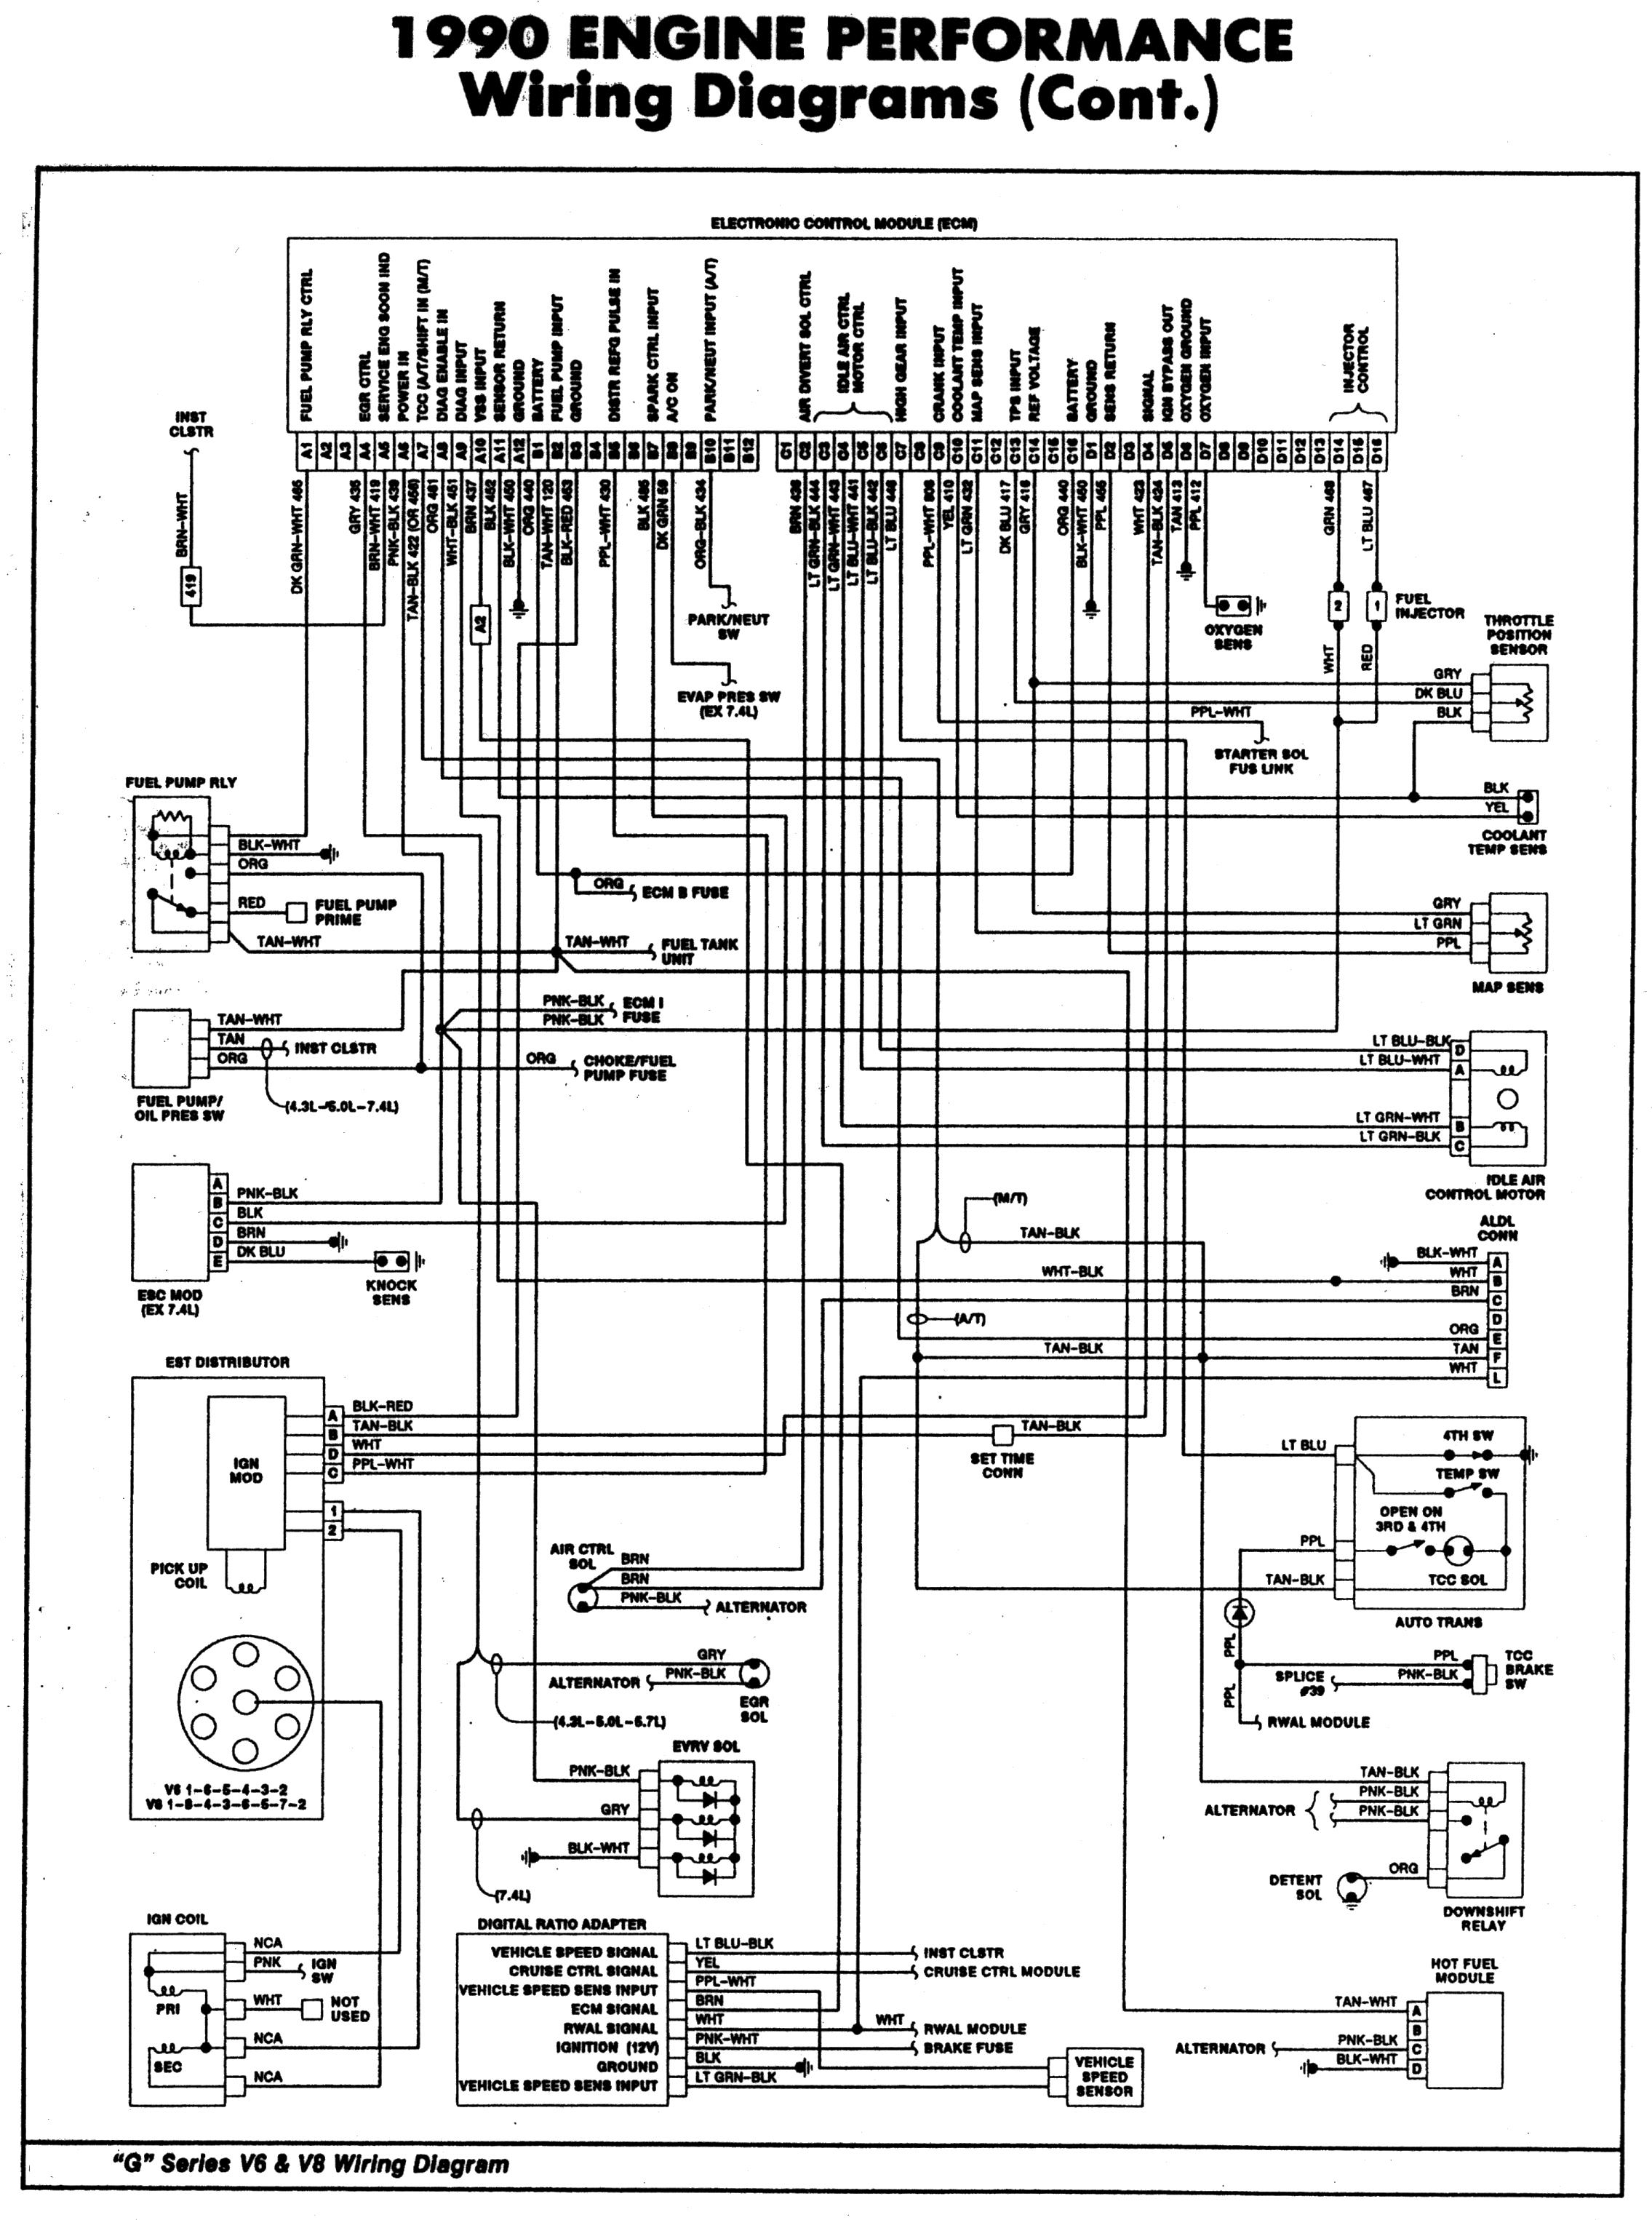 ignitiondiagram 1990 chevy suburban | TBI 350 Installation